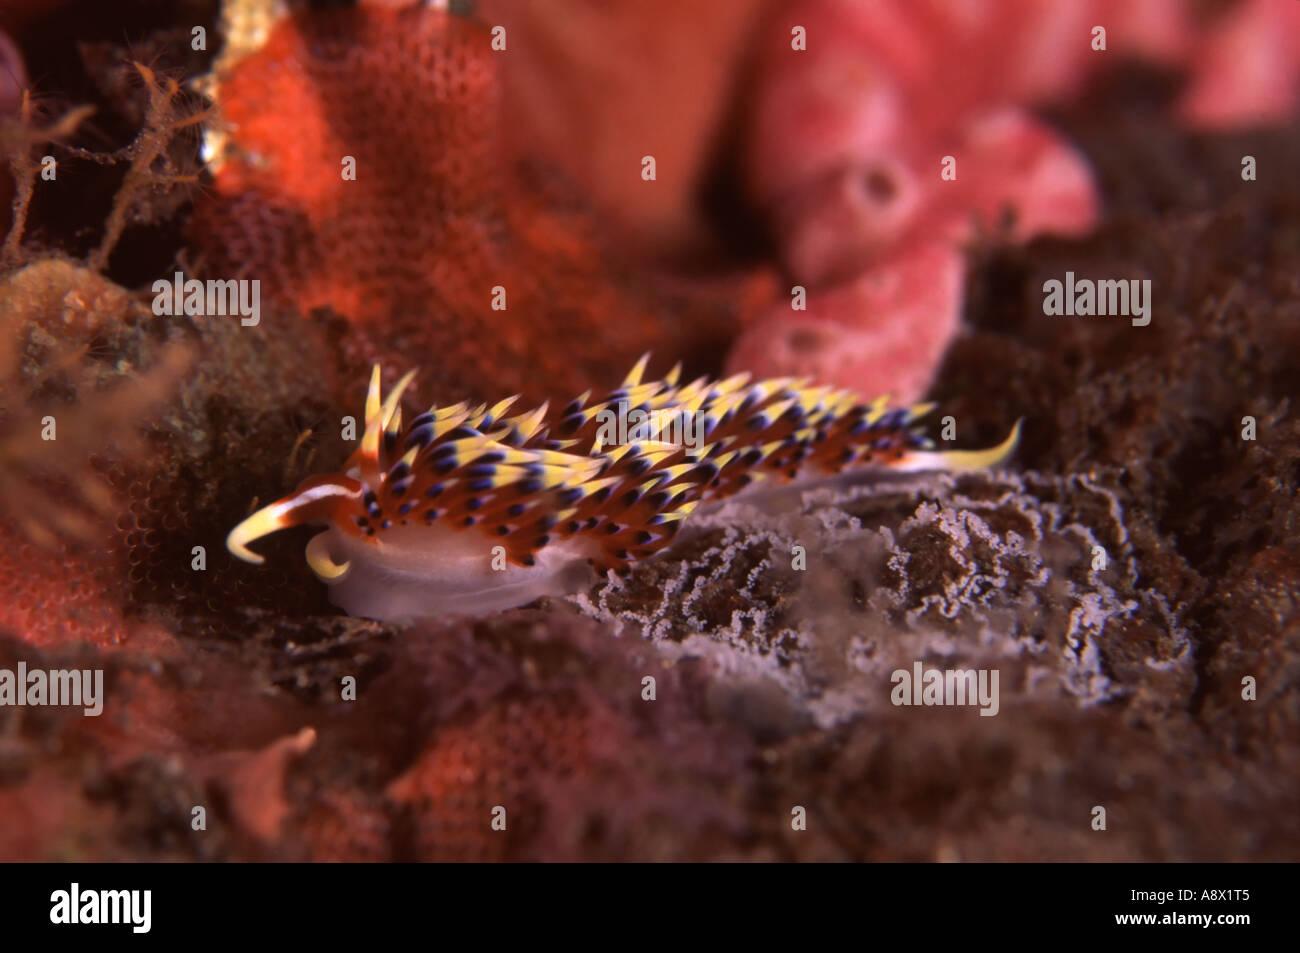 Phidiana sp. - Stock Image